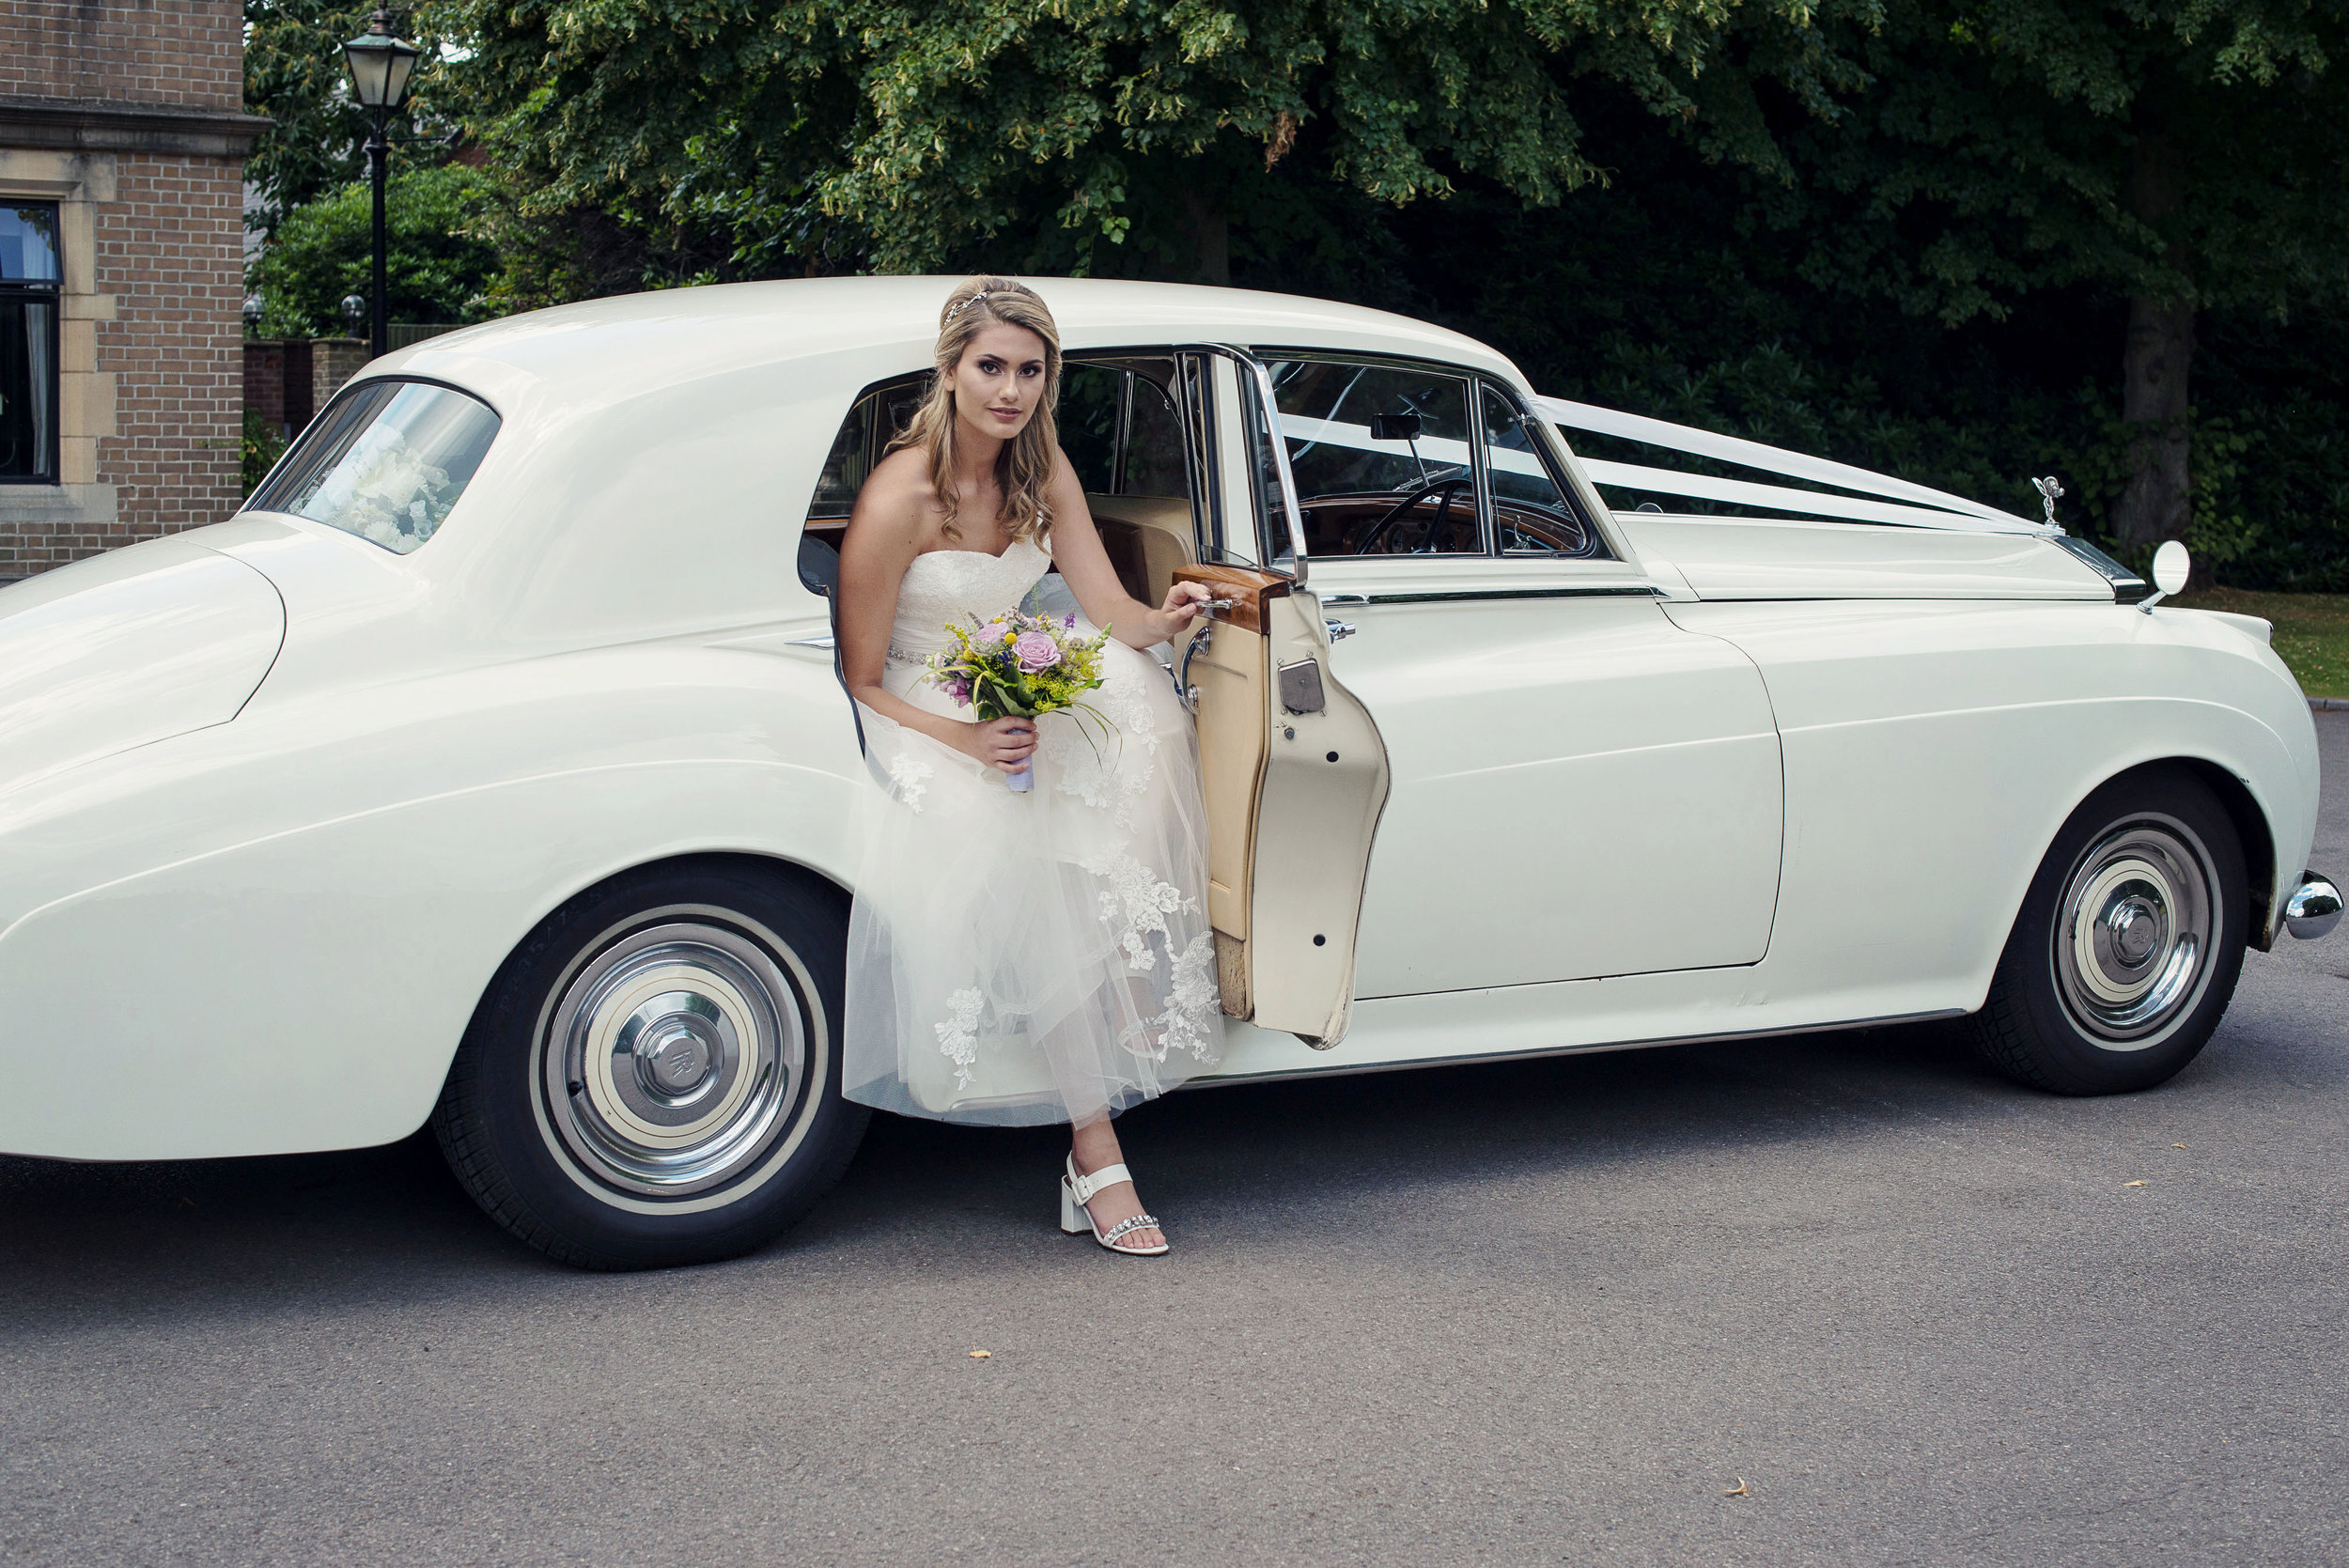 Classic-Car-Hire-Rolls-Royce-Silver-Cloud-1961-Foxhills.jpg